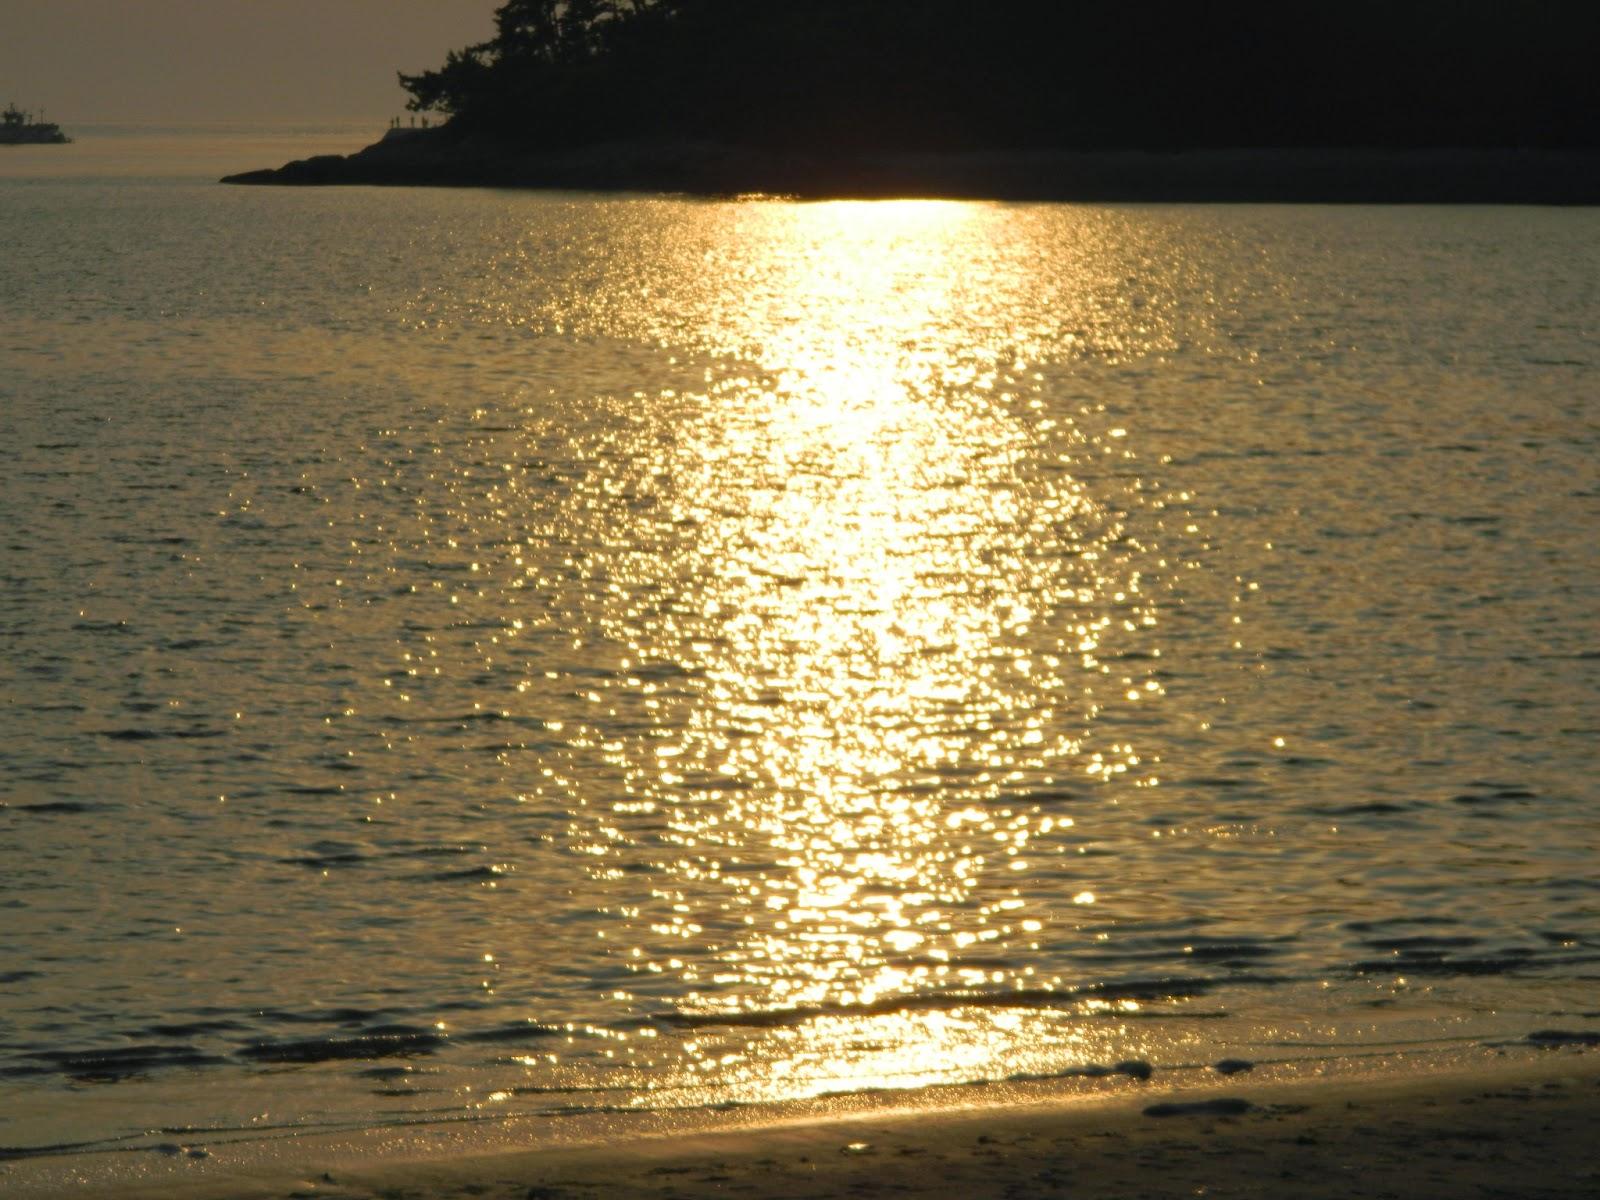 golden waters in Seonyudo island